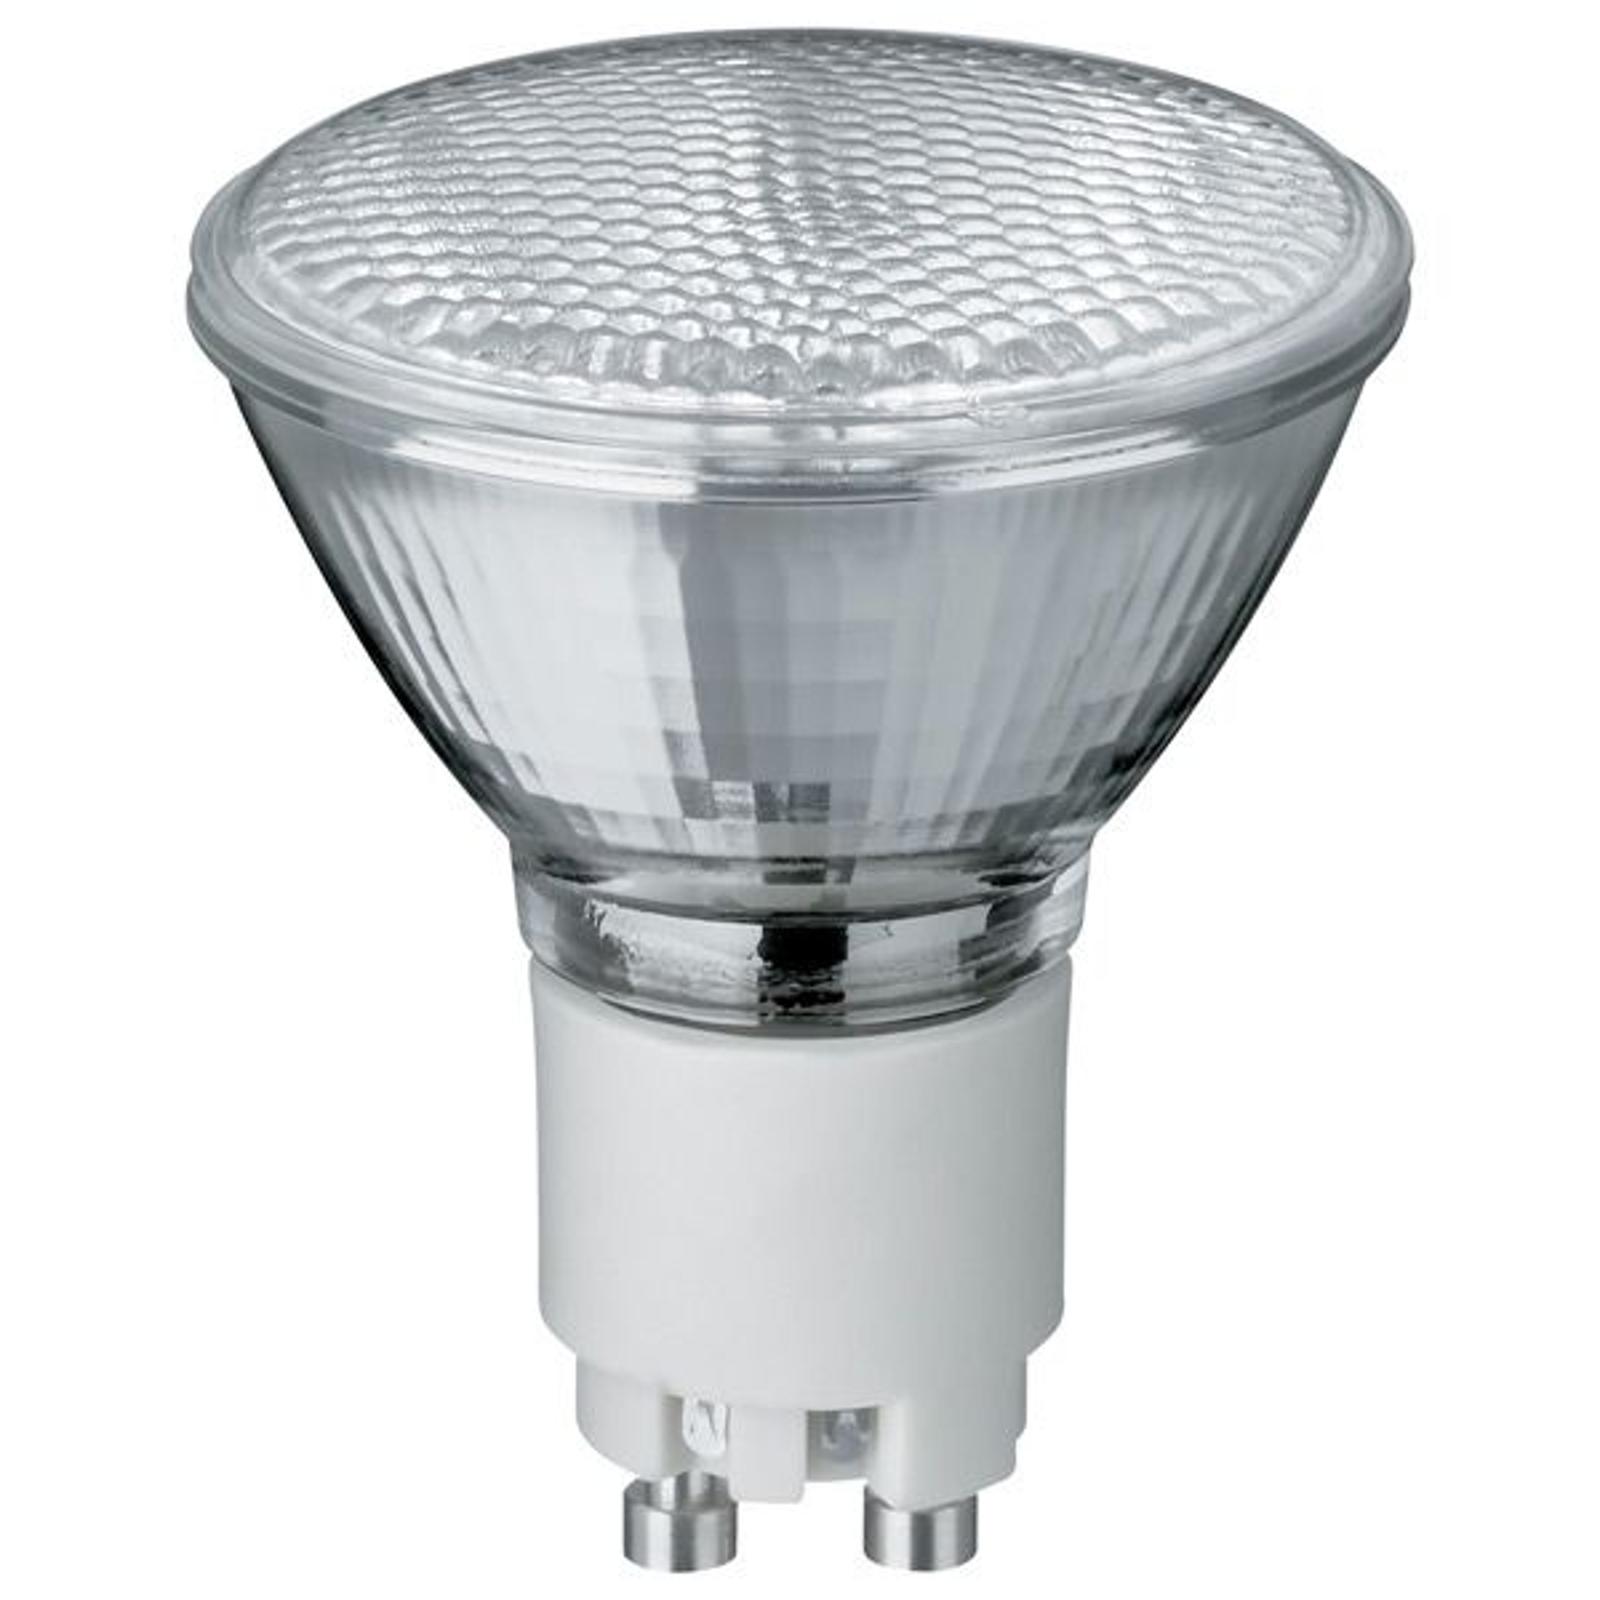 GX10 20W 25° urladdningslampa Mastercolor CDM-R